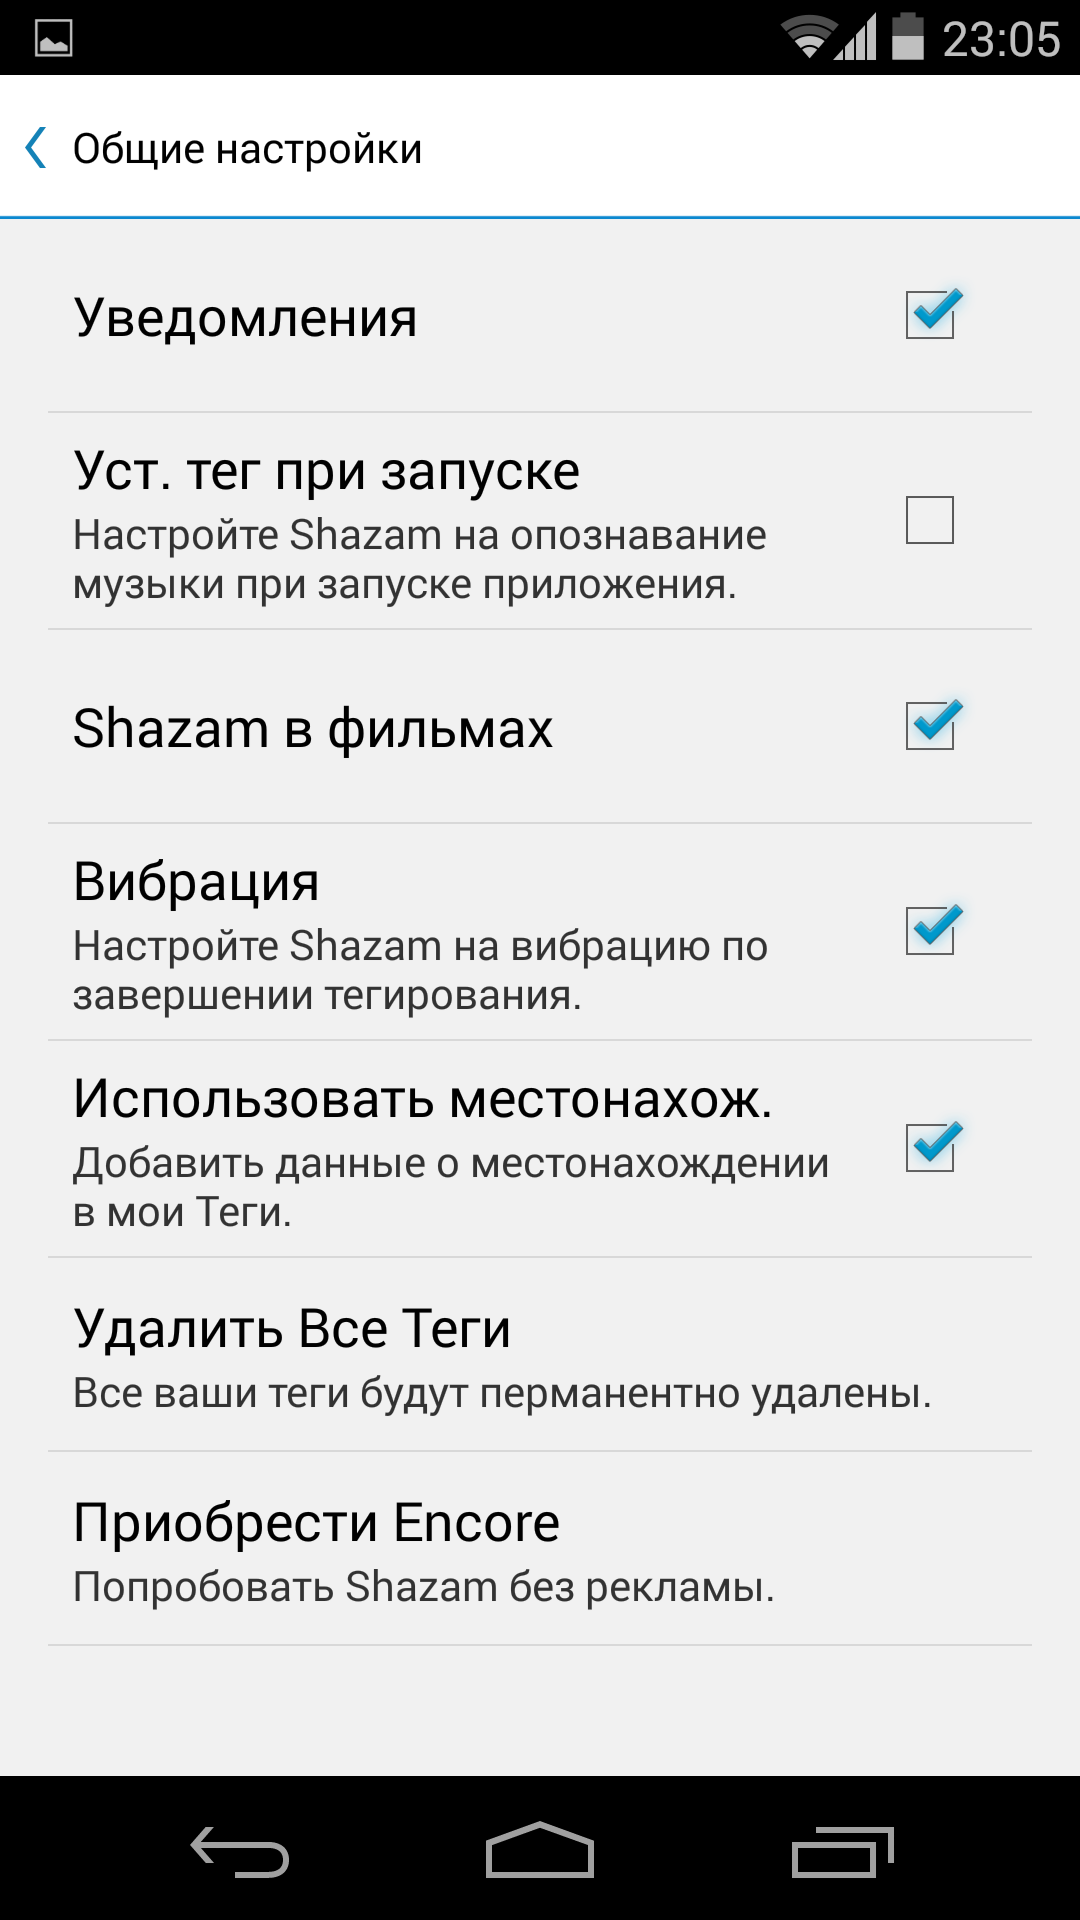 Настройки Shazam